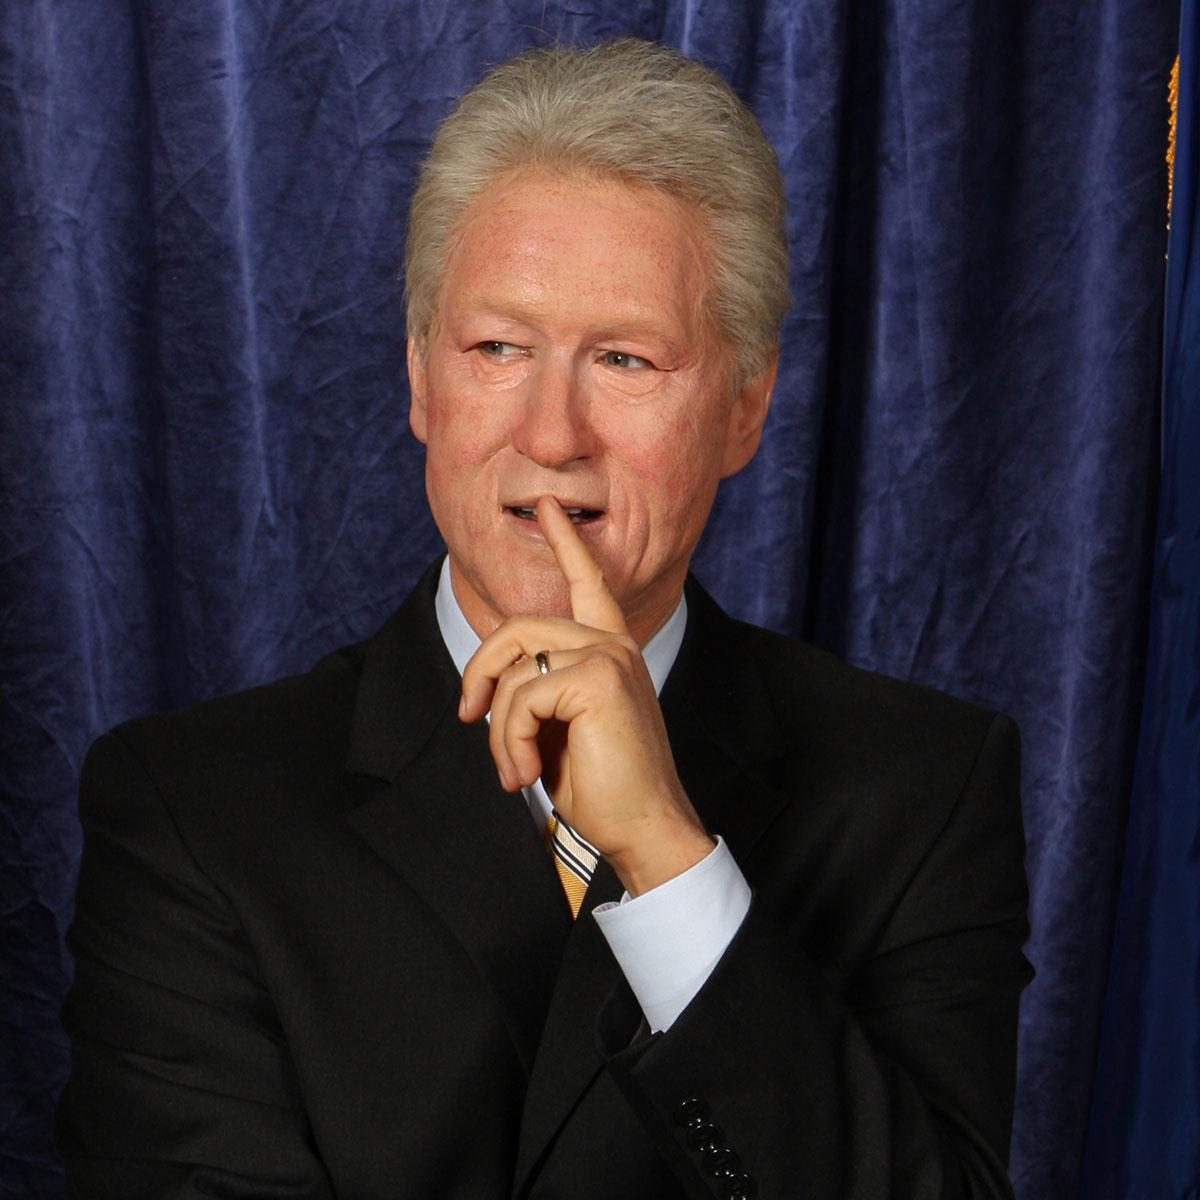 Steve Bridges, Bill Clinton